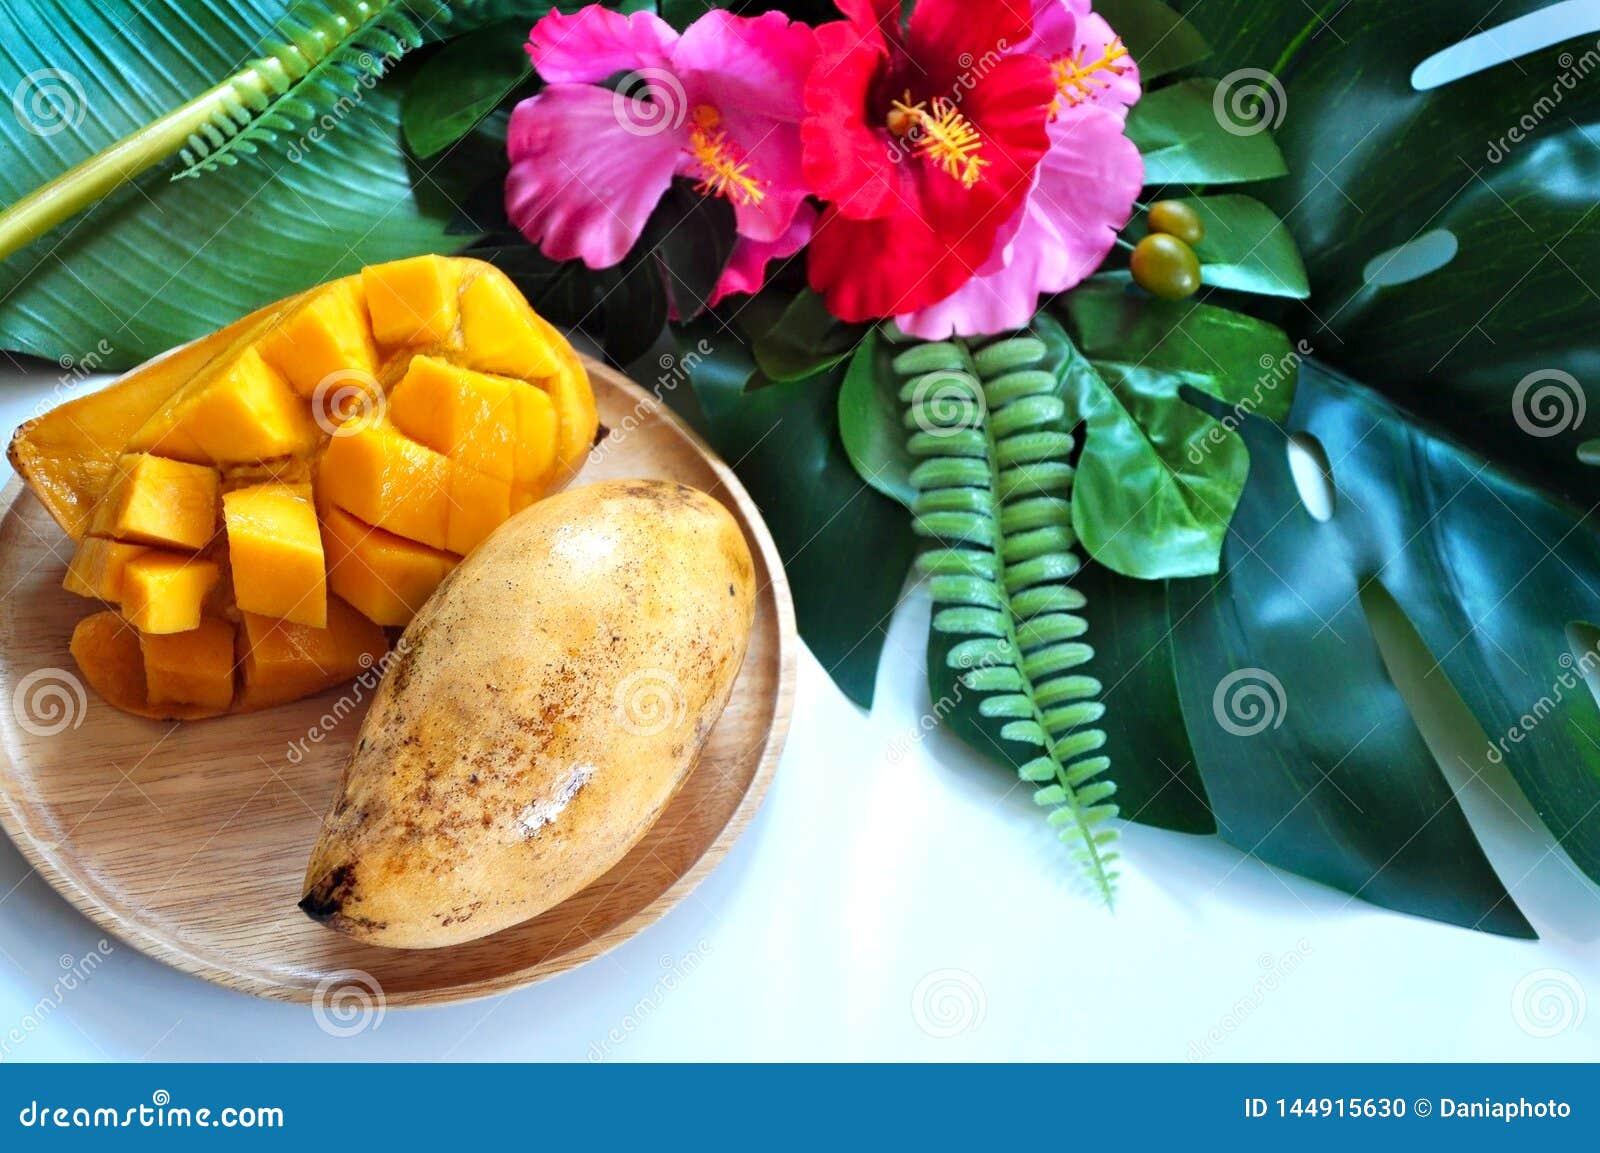 Sweet Thai Mango  on Wooden Plate